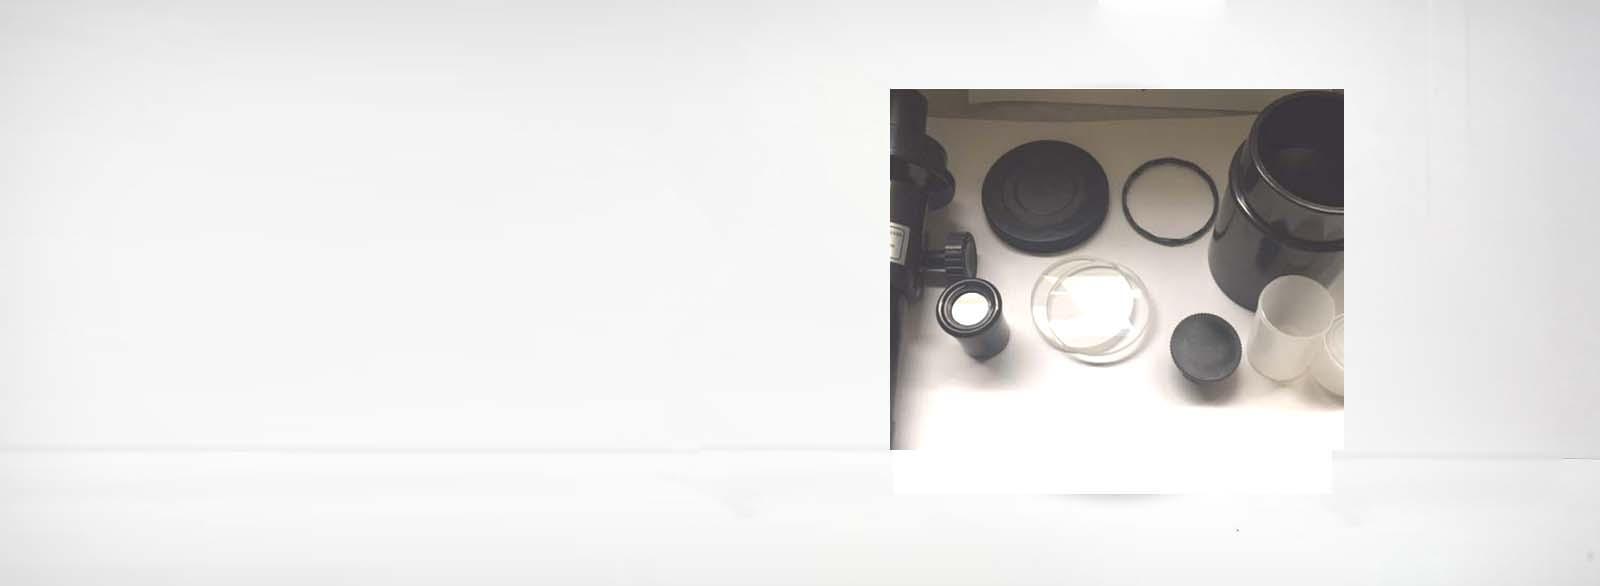 Educational Telescope Kit